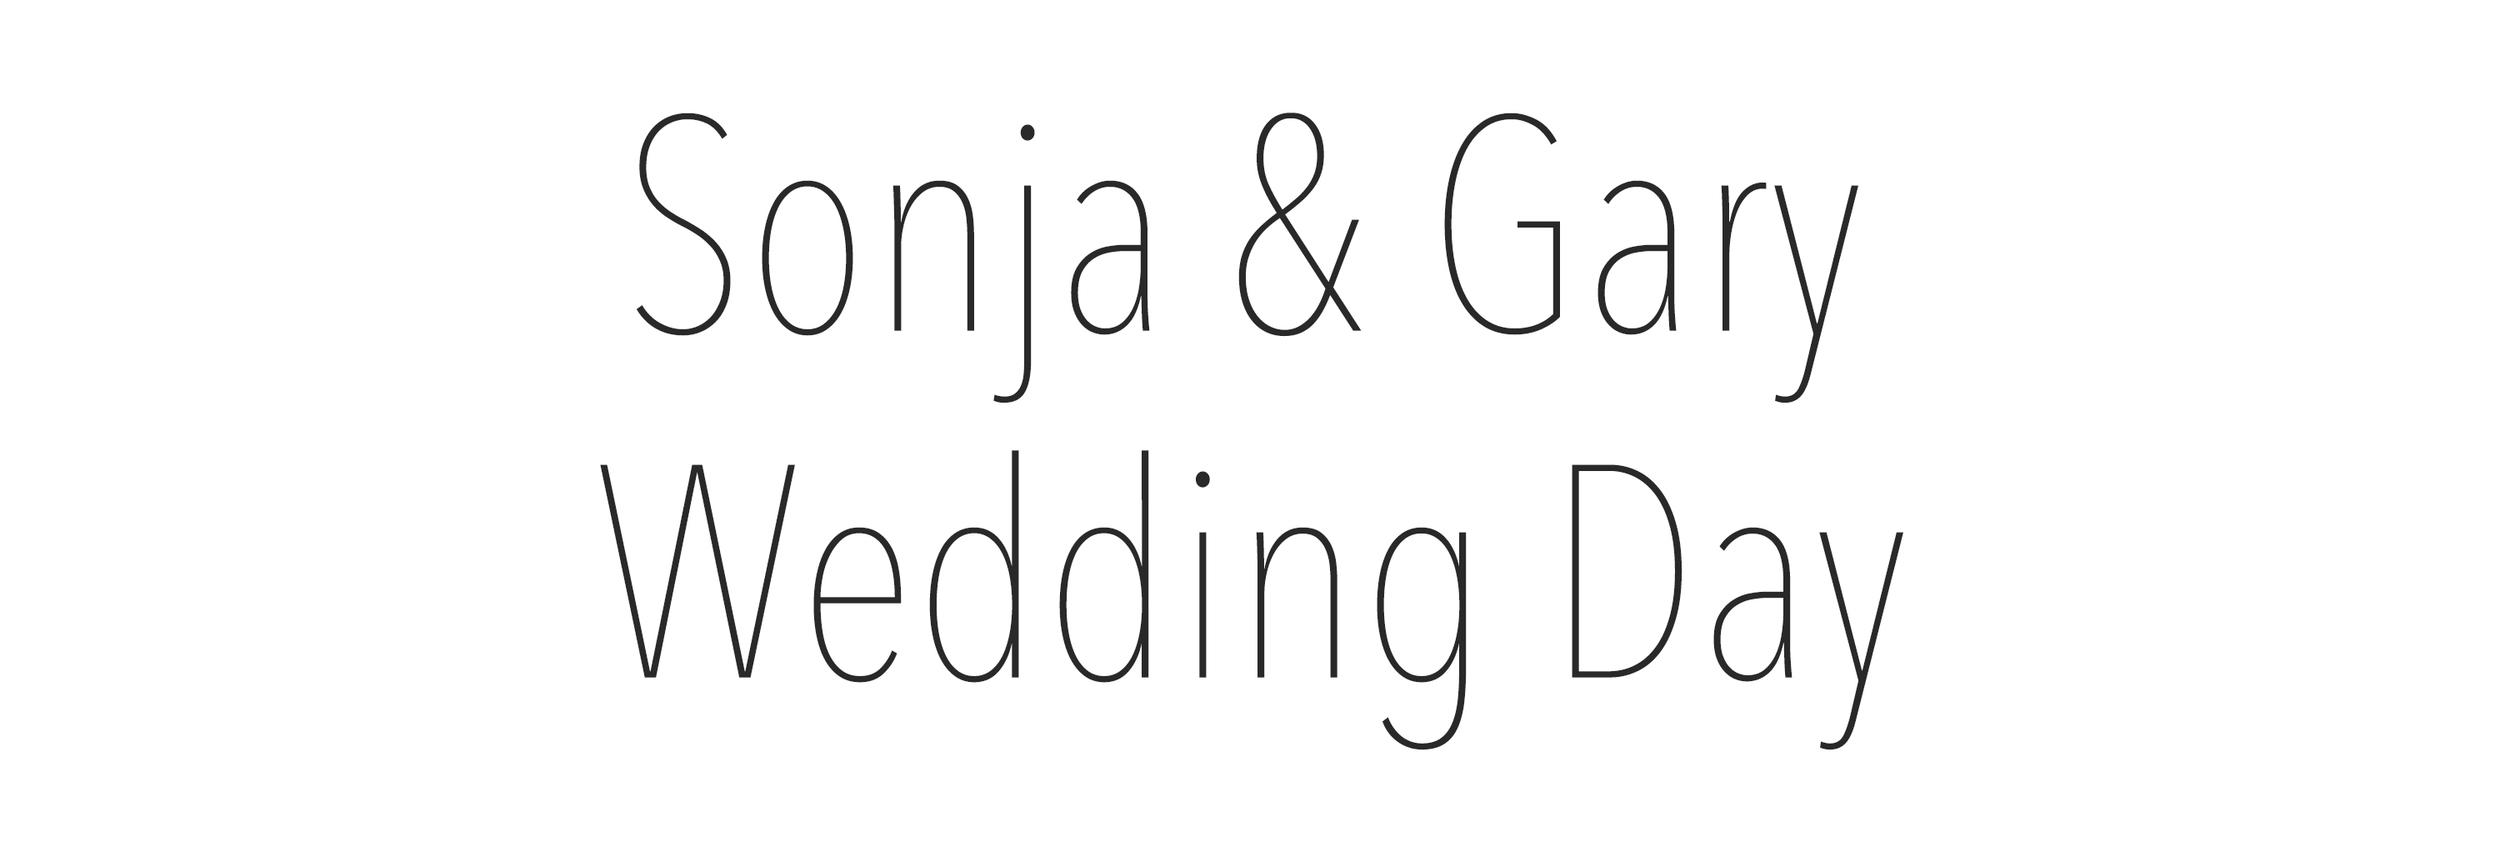 Sonja&Gary_Wedding_Day.jpg